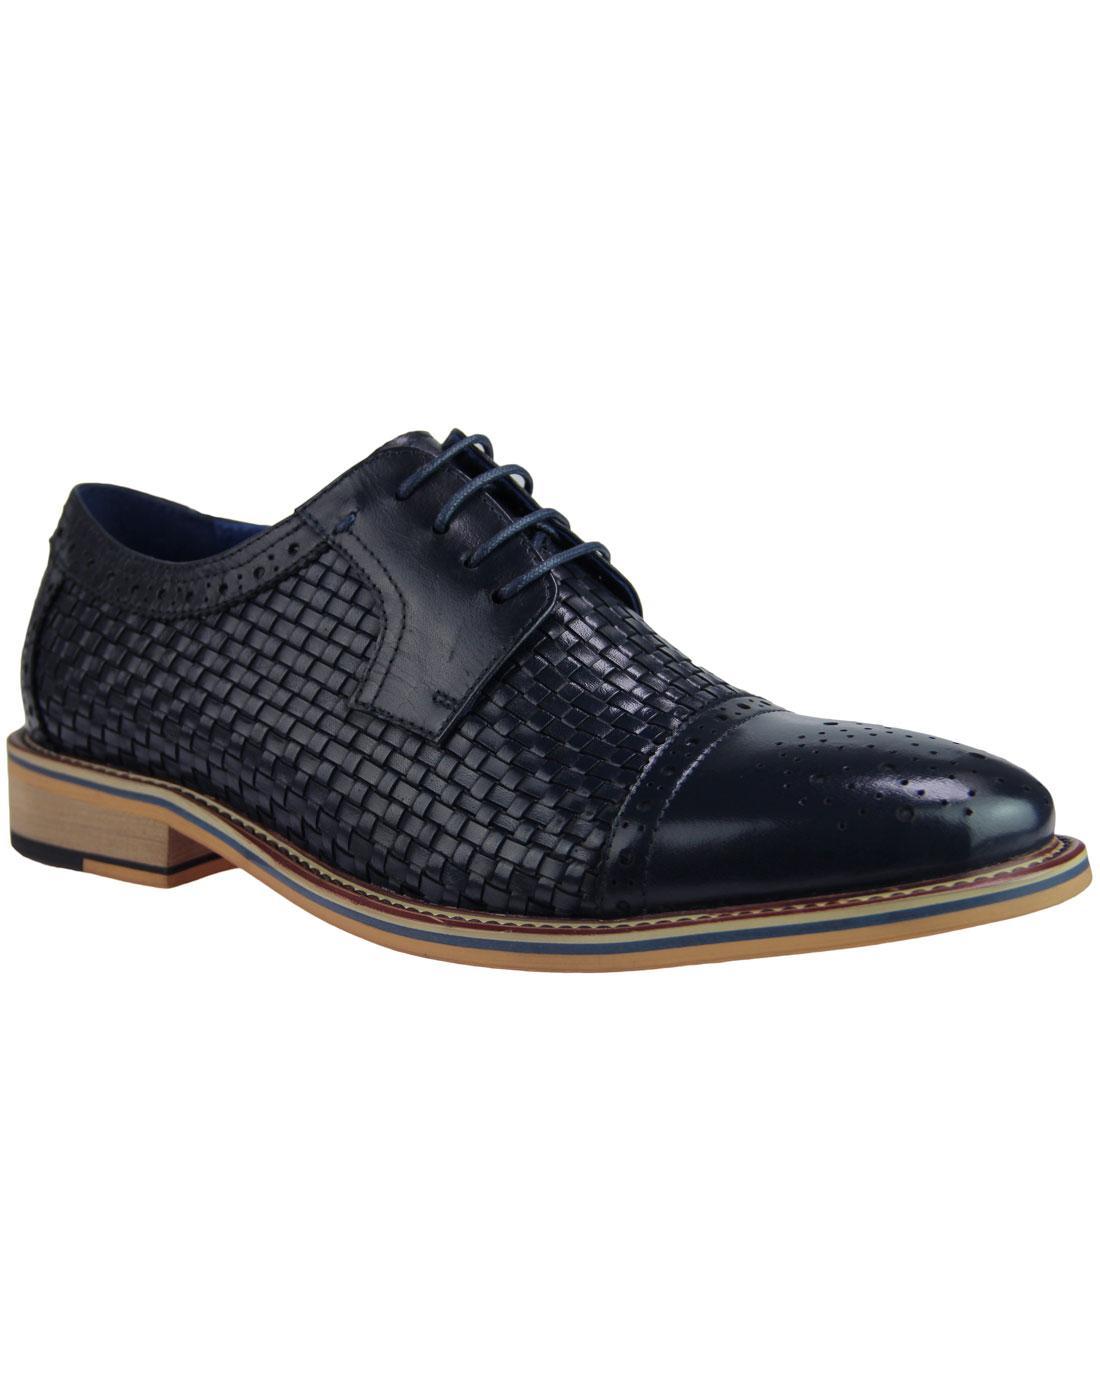 Gabriel SERGIO DULETTI Mod Weave Brogue Shoes NAVY